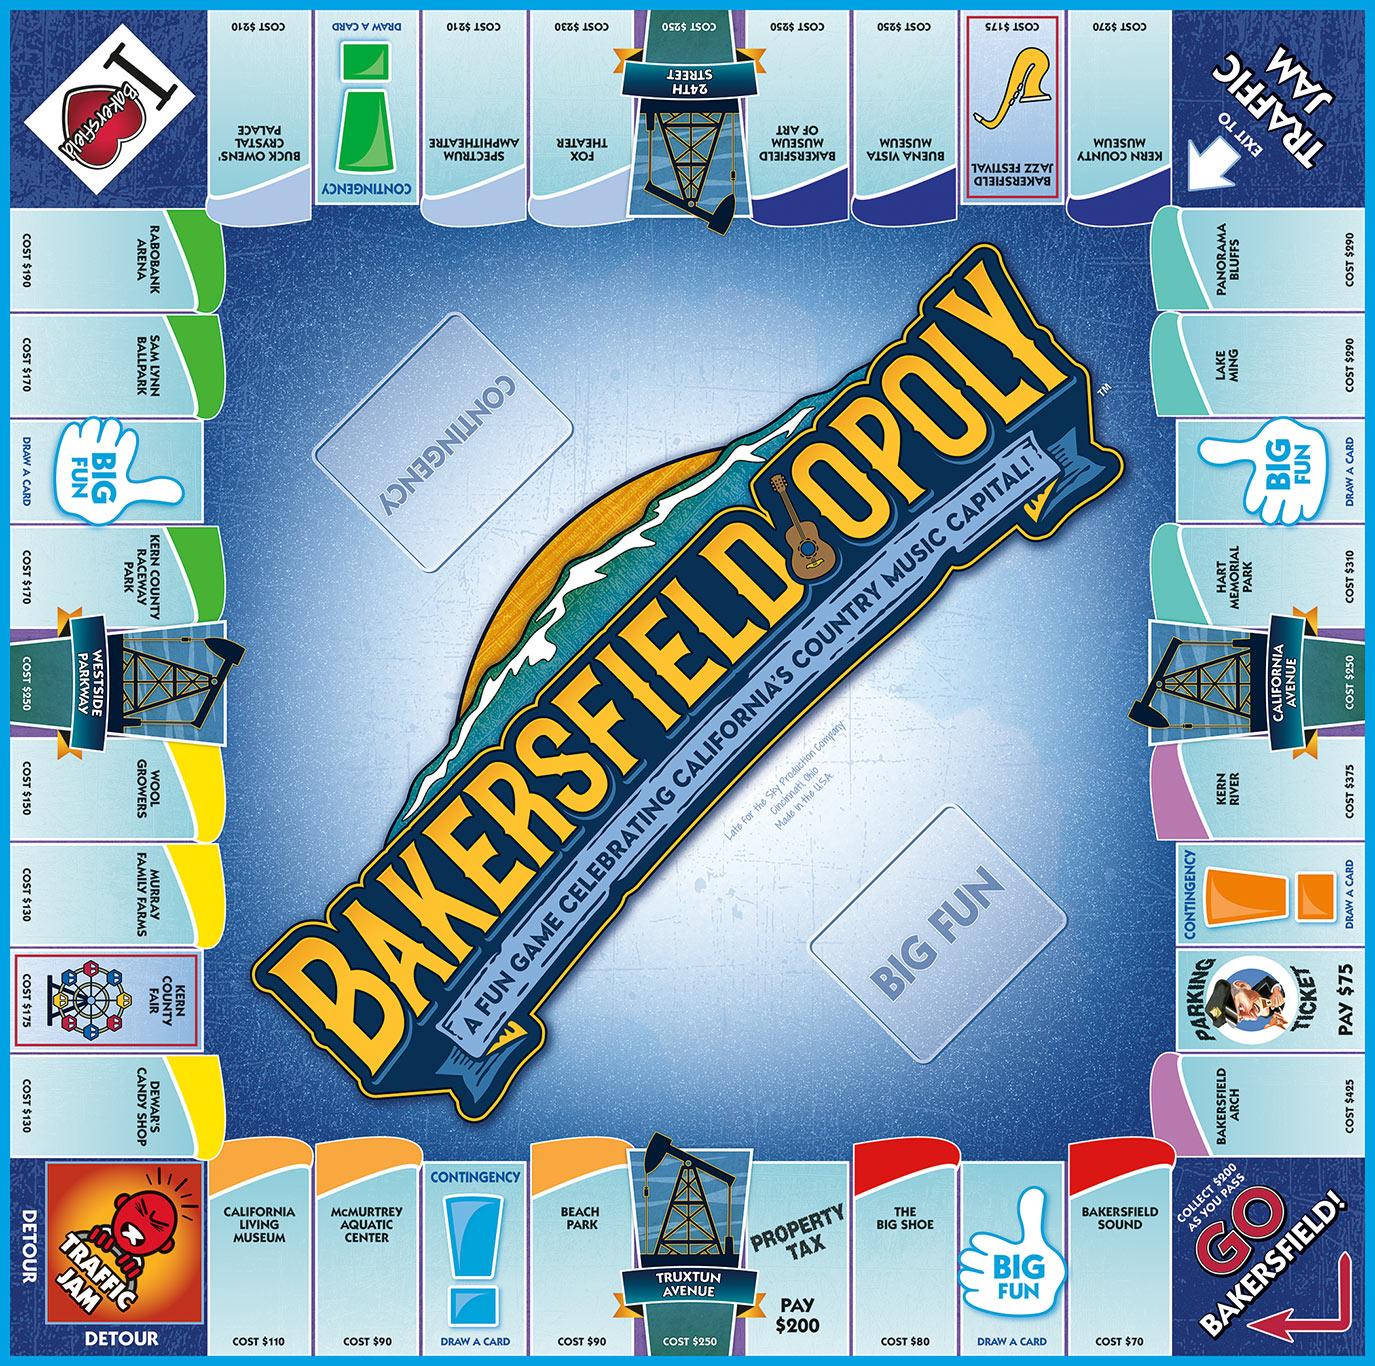 BAKERSFIELD-OPOLY Board Game